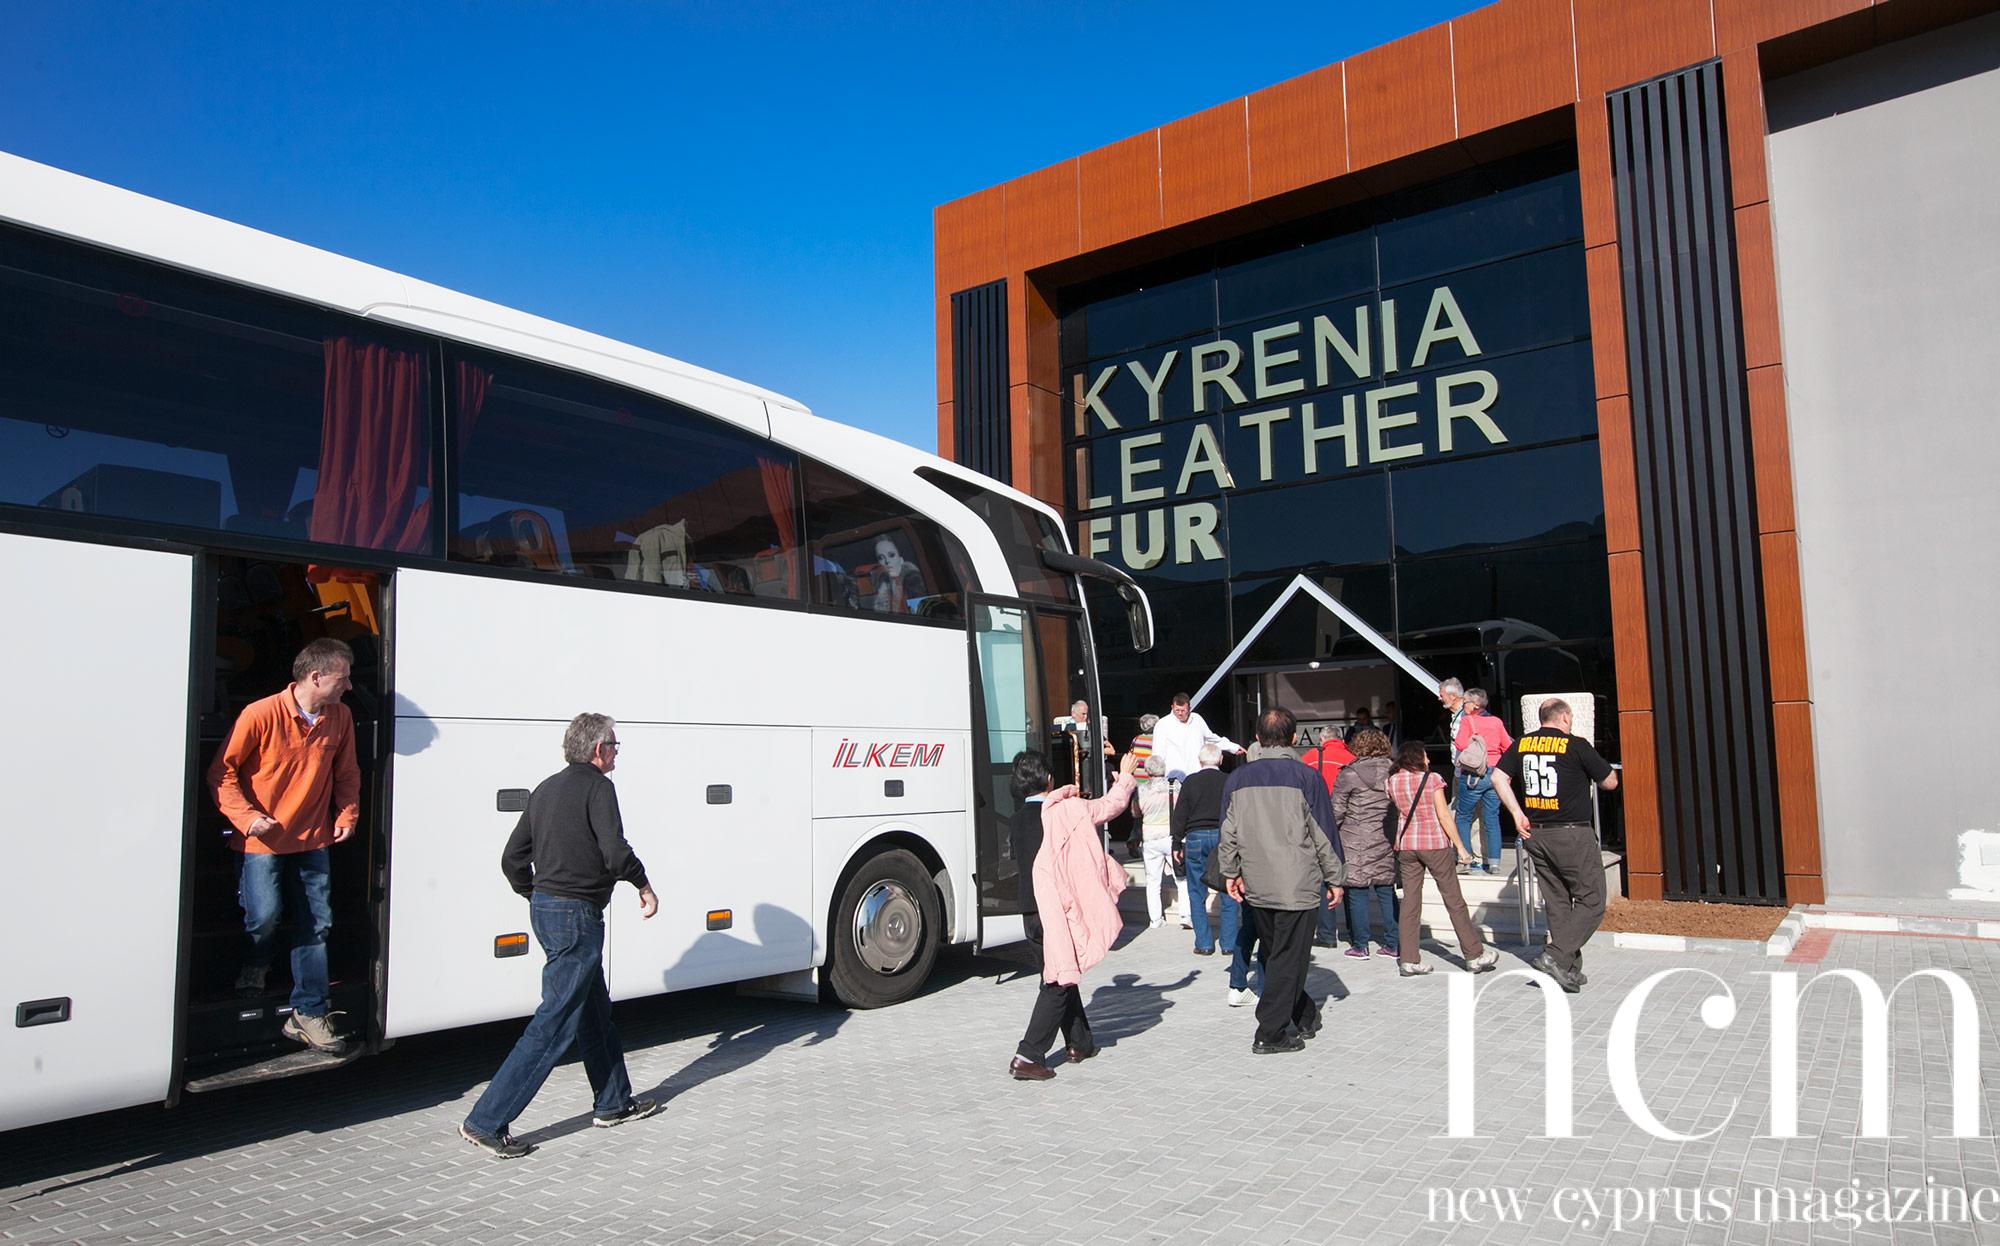 Leather Fur Kyrenia North Cyprus